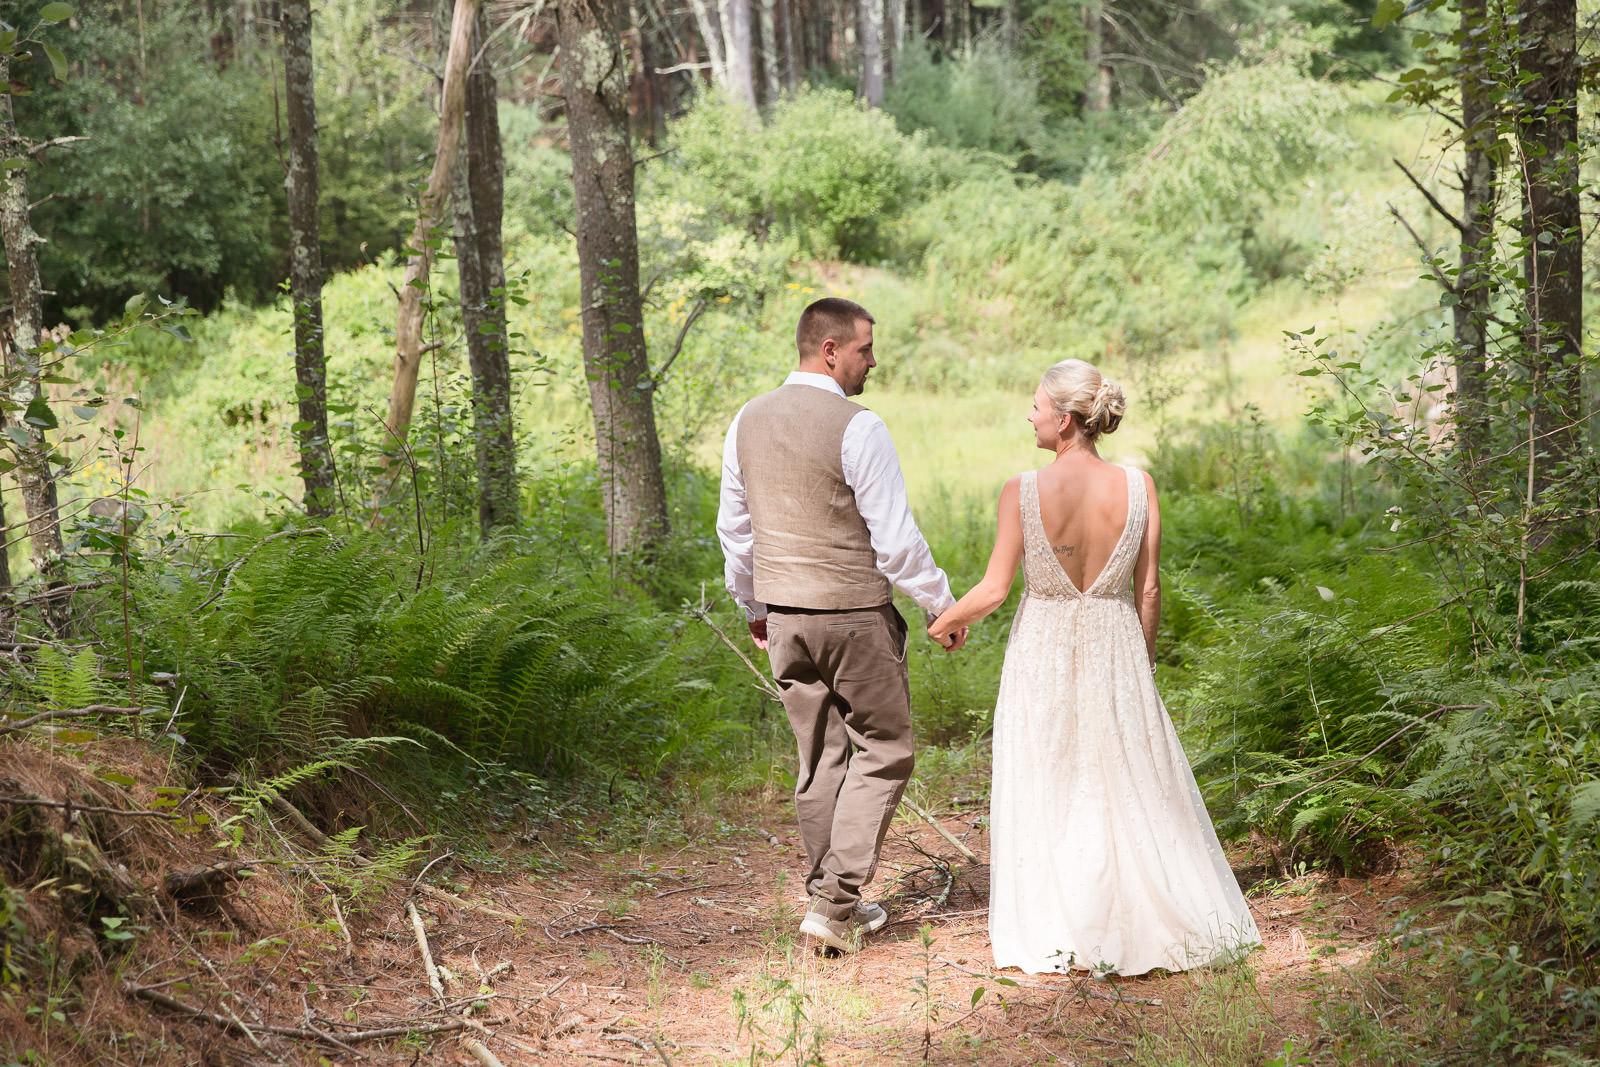 Coventry, Rhode Island, RI, Backyard Wedding, forest, earthy, wedding, tracy jenkins photography, wedding photographer, ri wedding photographer, Rhode Island Wedding photographer, walking in the woods, couple photos